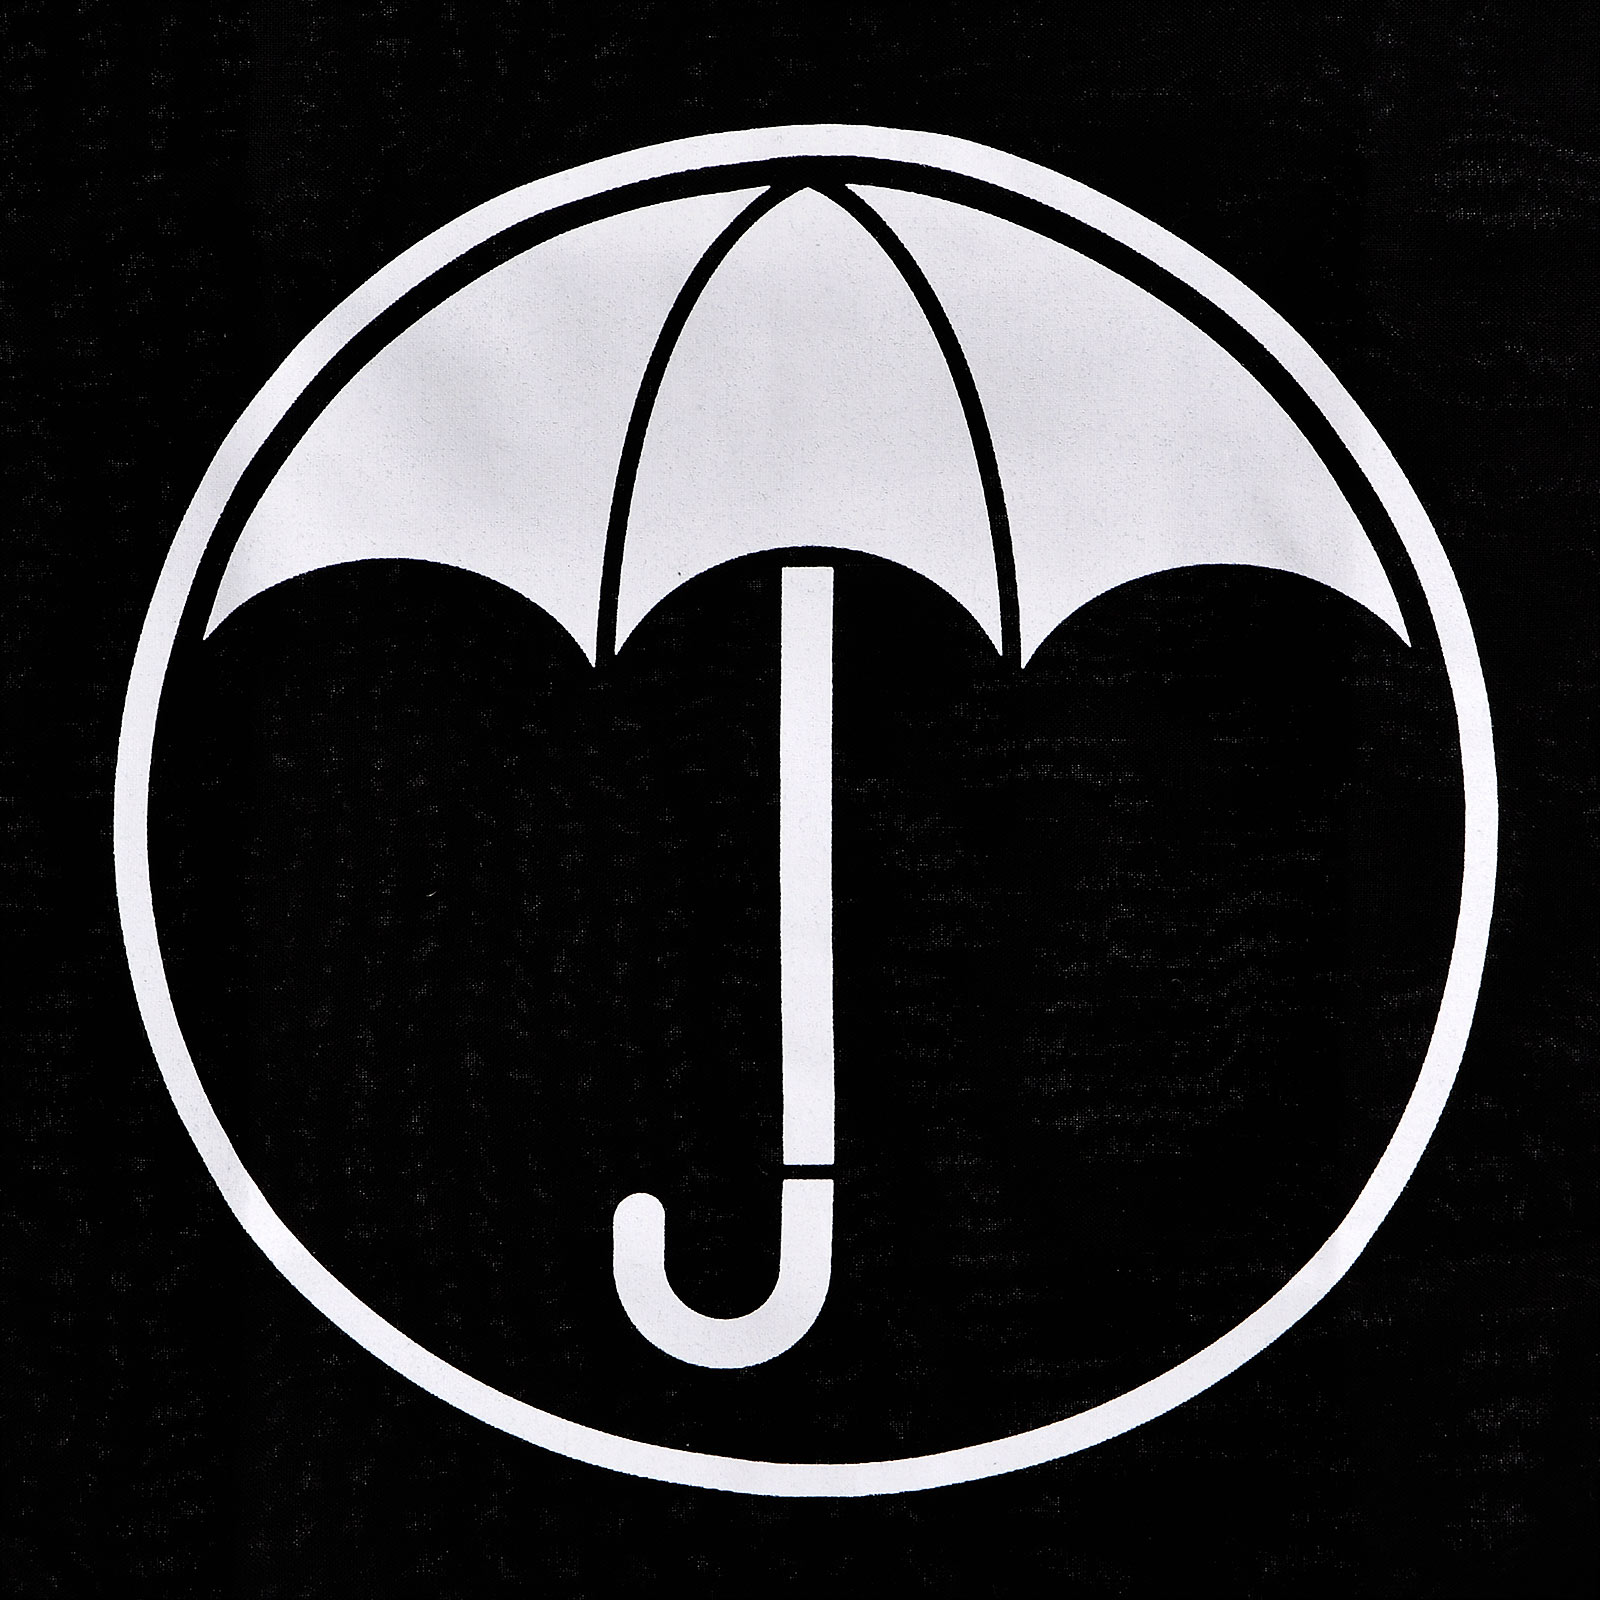 Logo Sportbag für The Umbrella Academy Fans schwarz